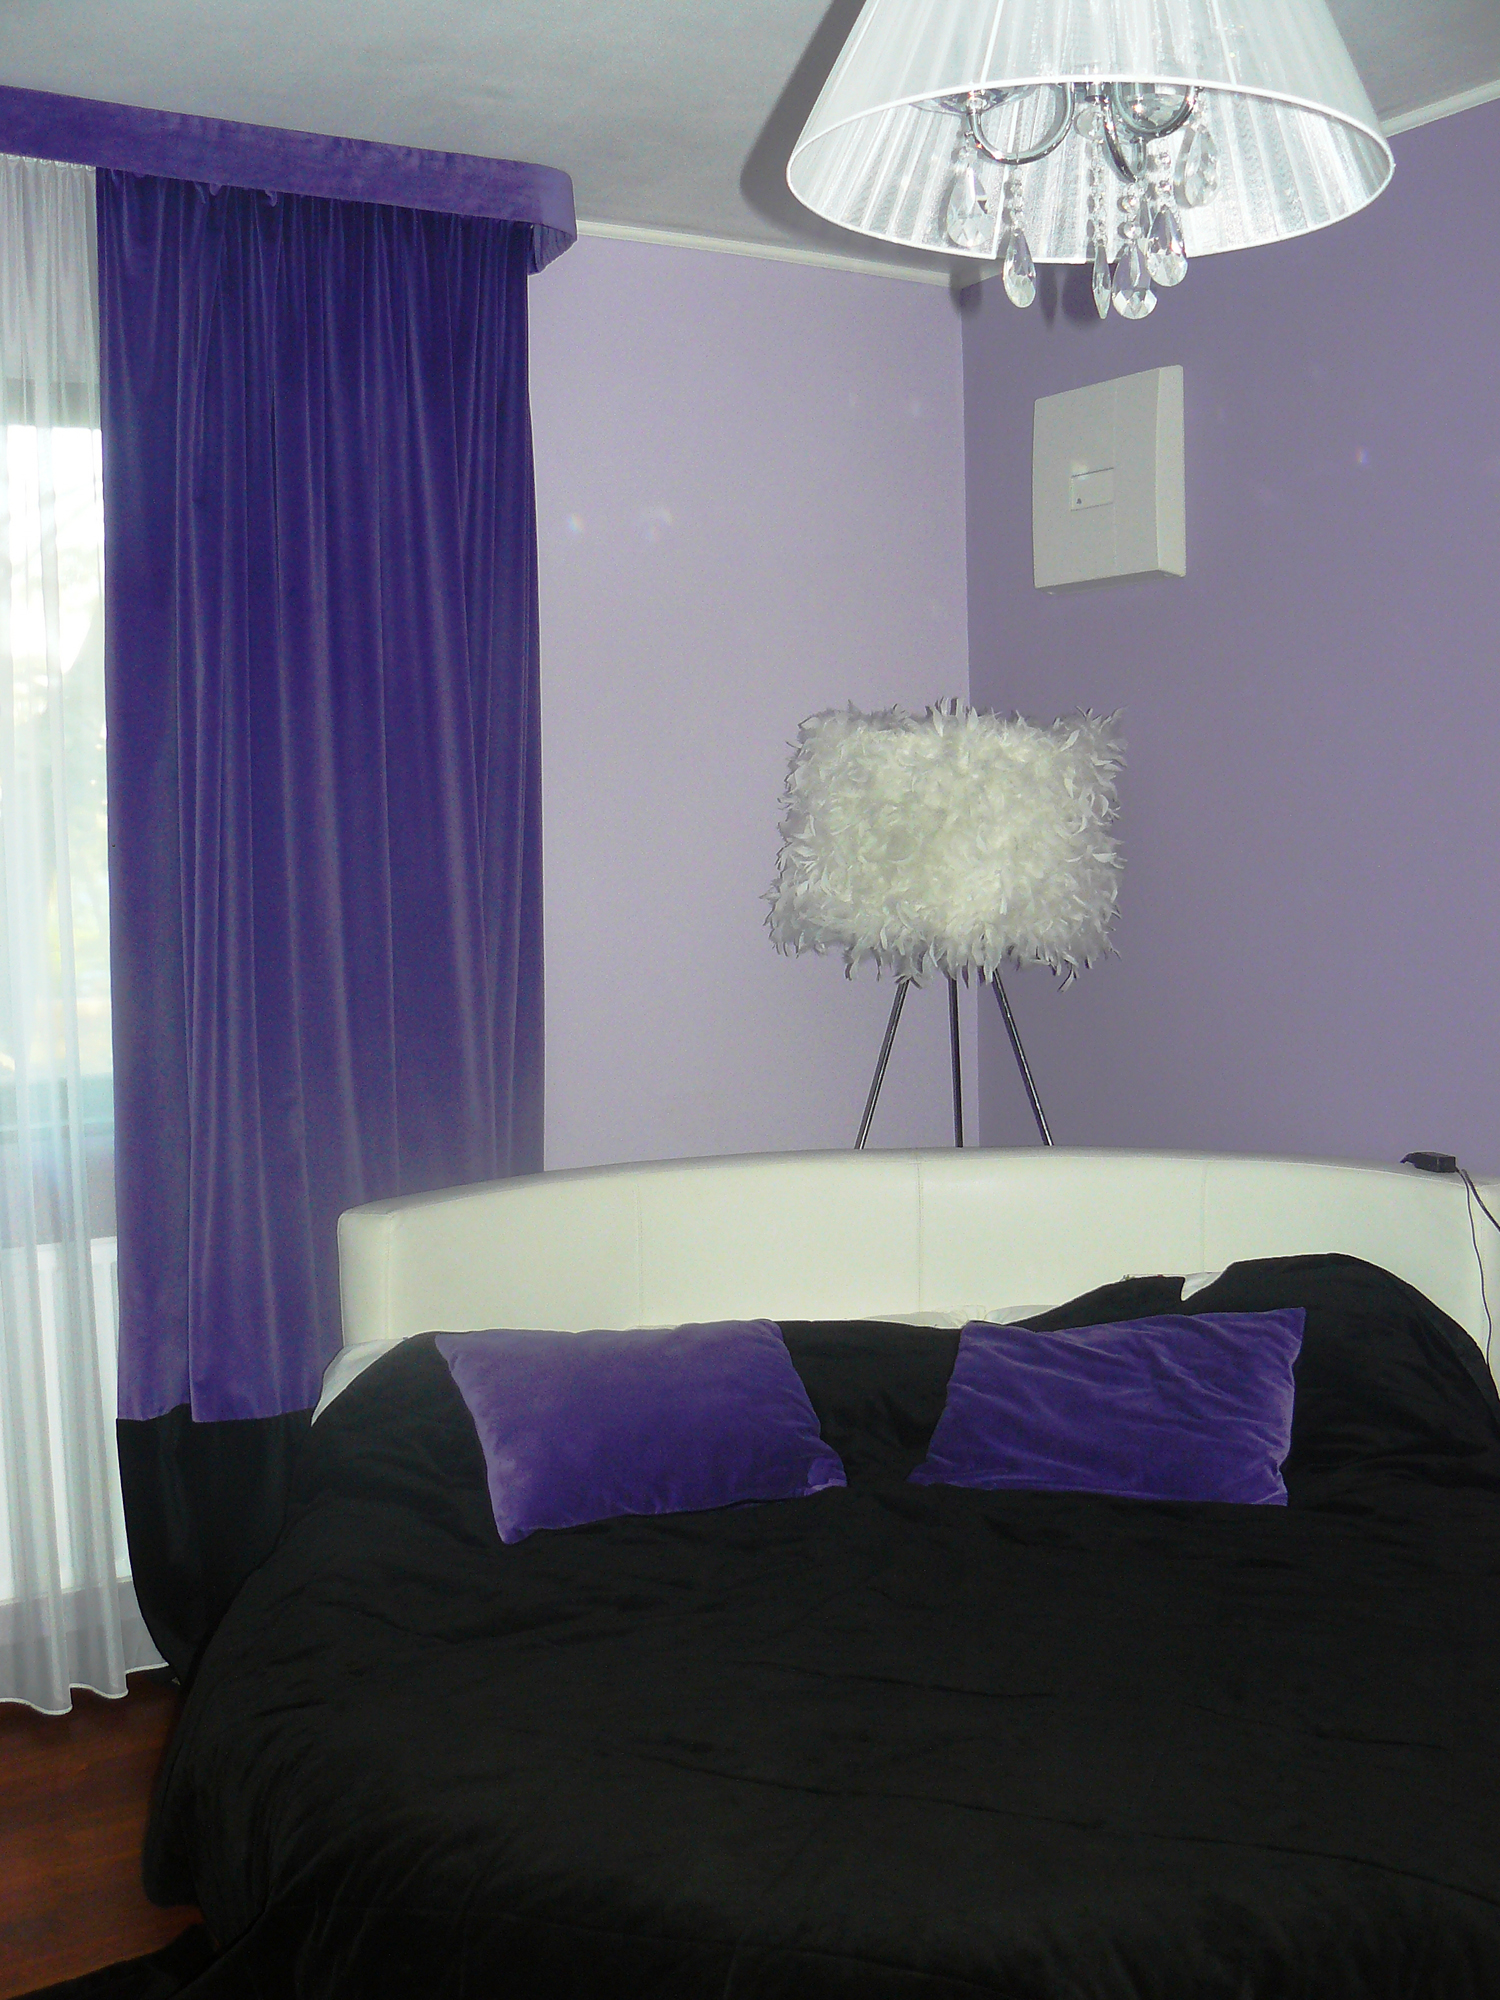 Perdele si draperii din materiale textile VRIESCO - Poza 6